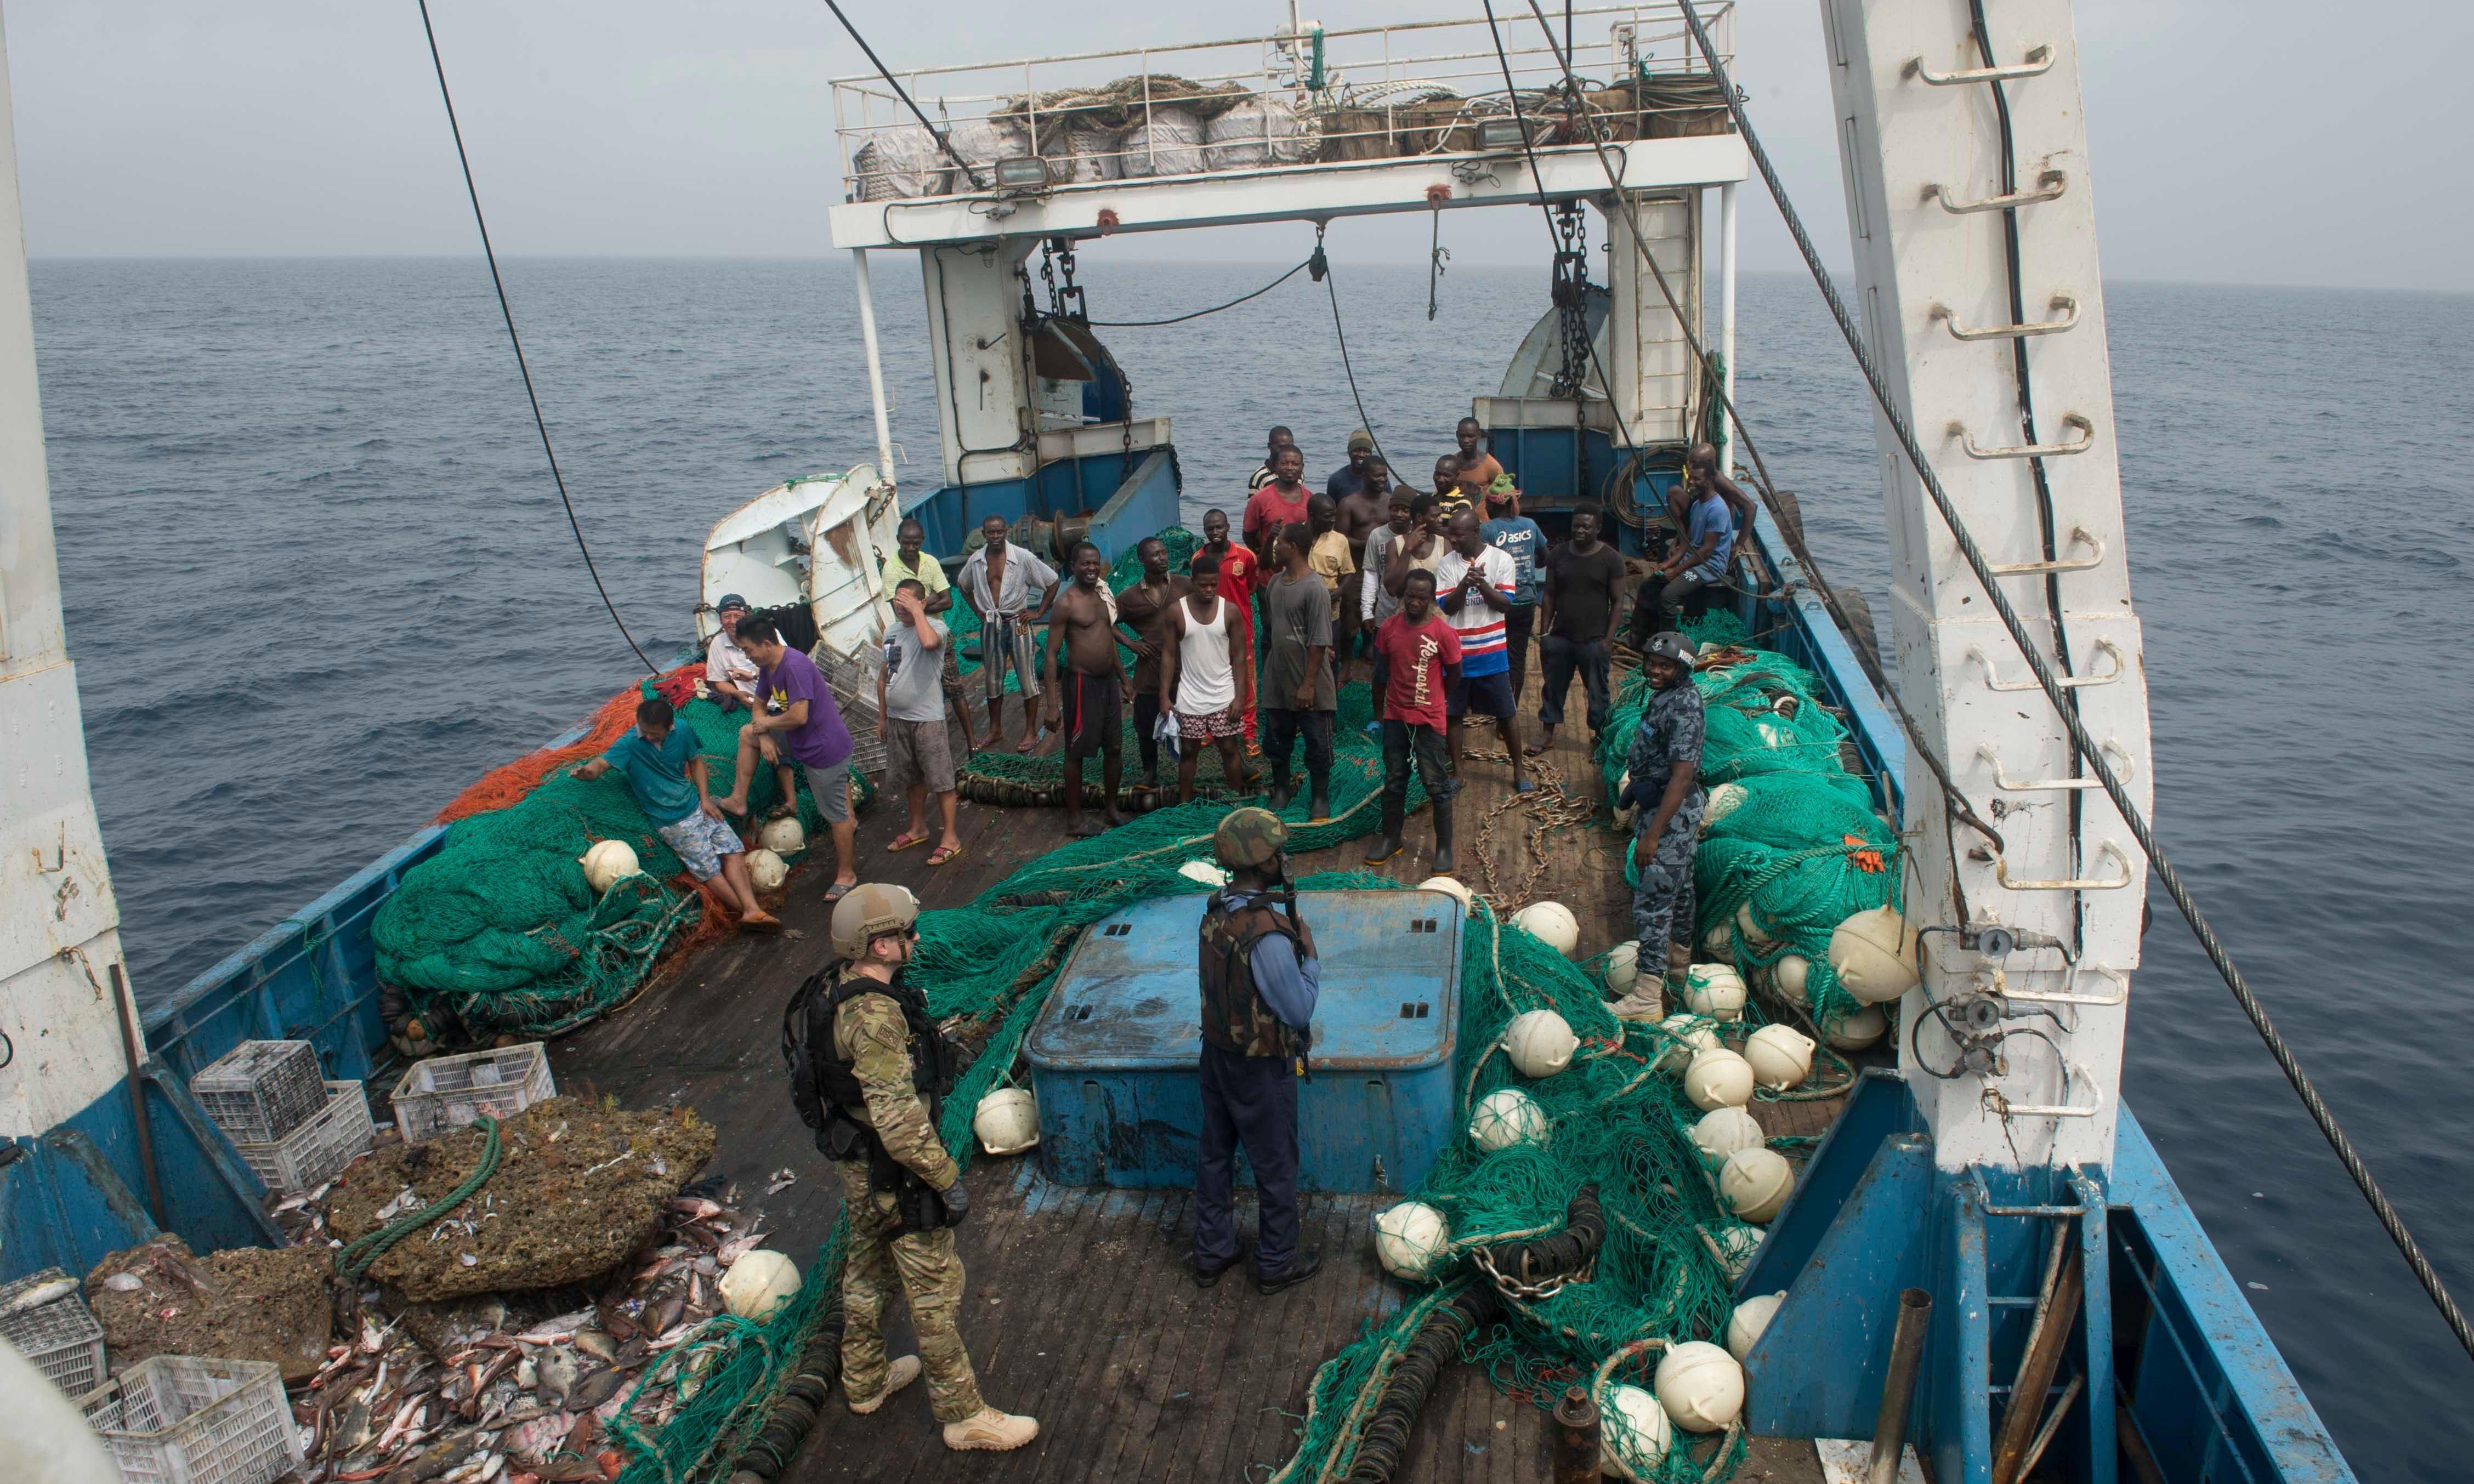 The vanishing: Ghana's defenders face new perils in fight against overfishing